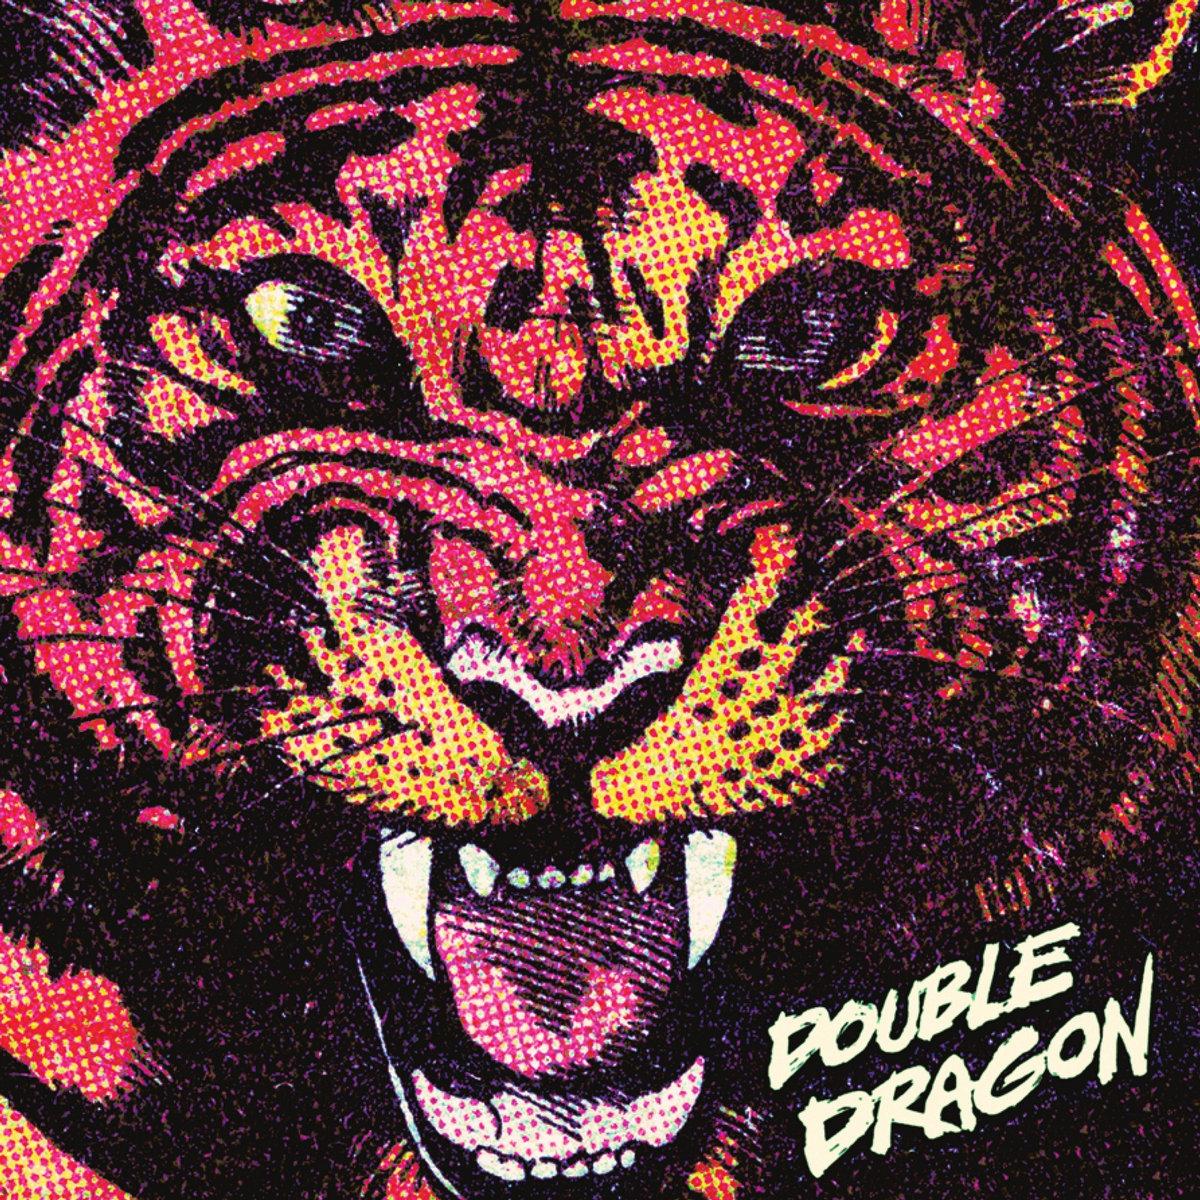 DOUBLE DRAGON Double dragon 2xLP